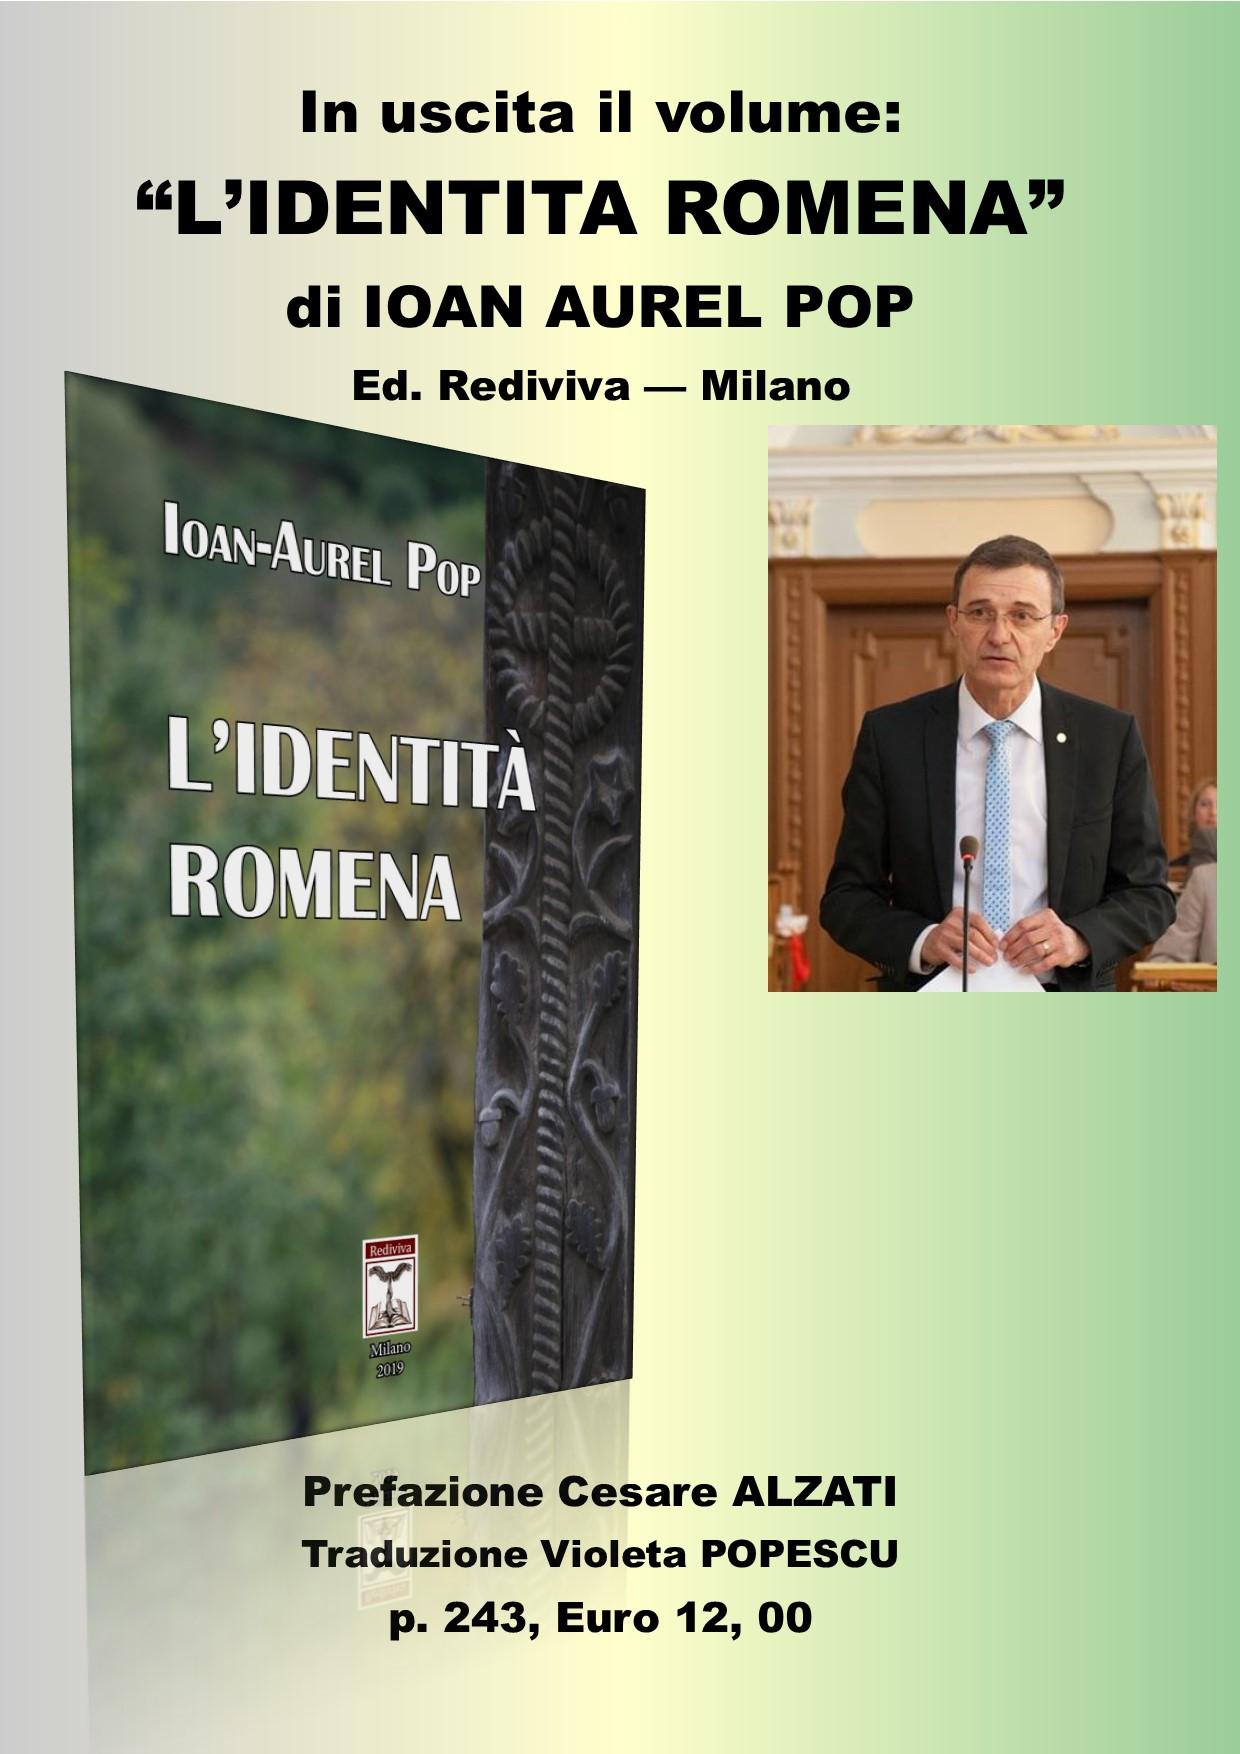 In uscita il volume: L'identità romena di Ioan Aurel POP, ed. Rediviva 2019